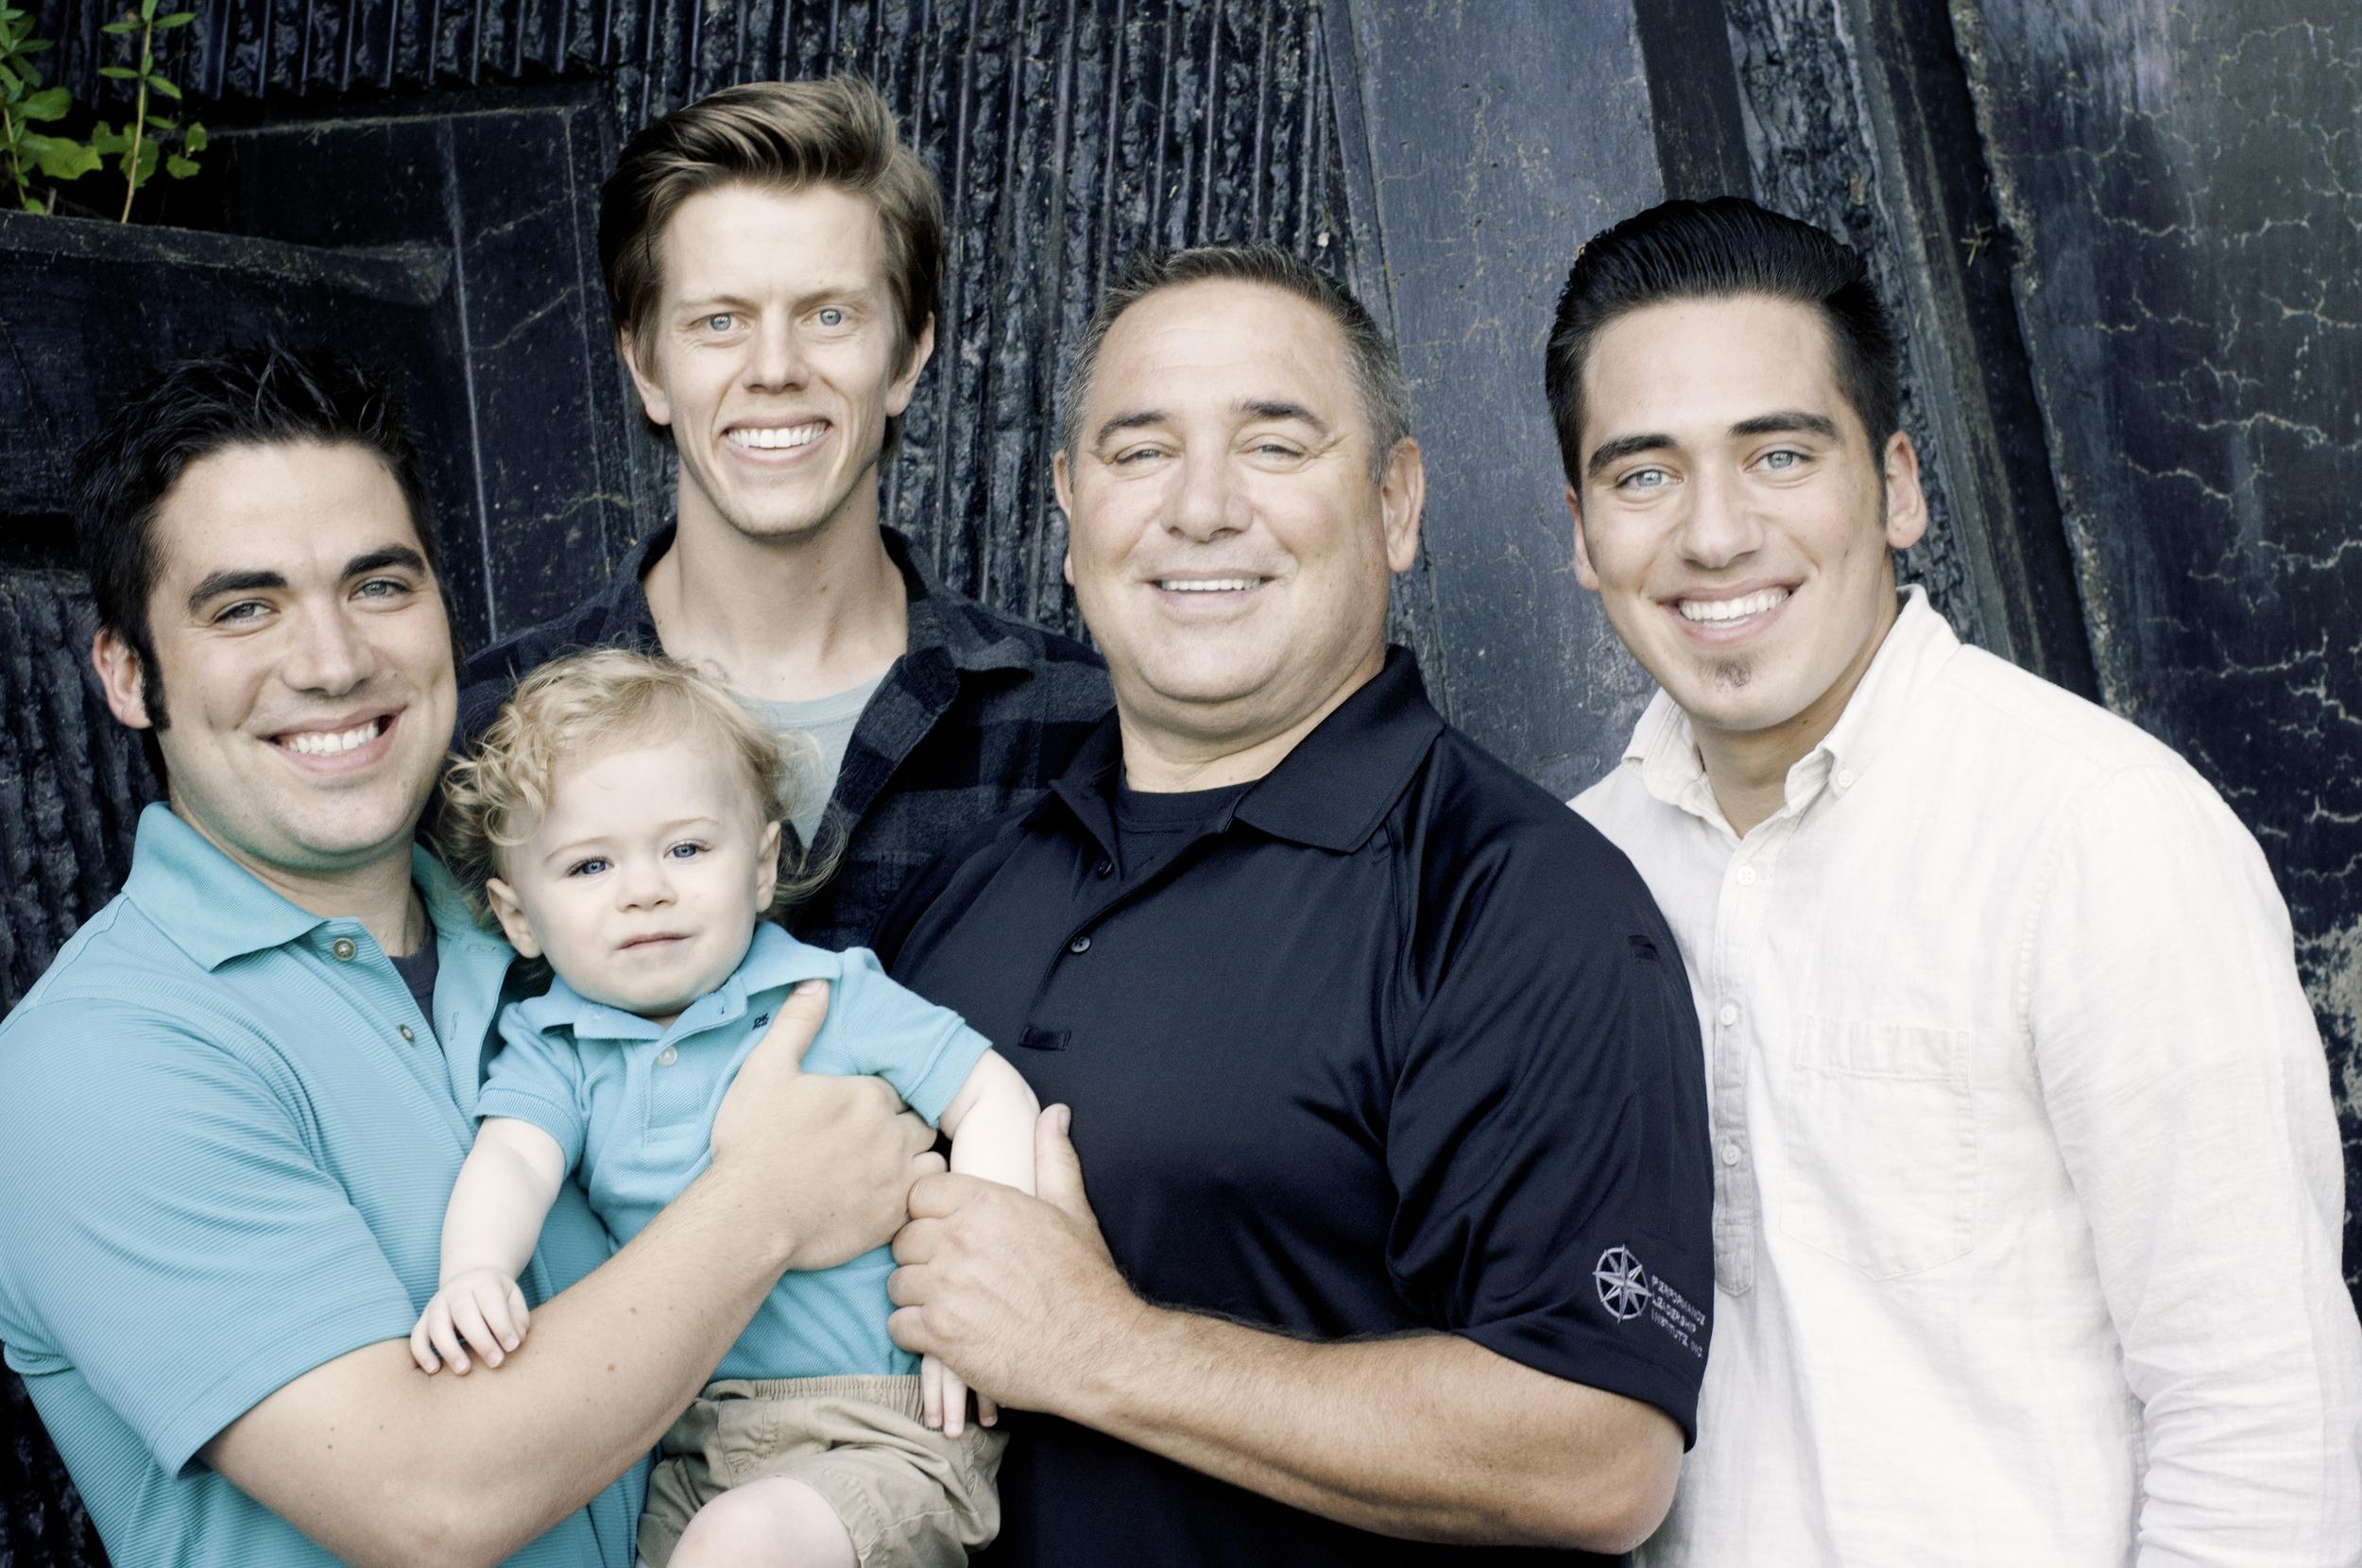 Ray Family Photos-Bob and boys.jpg